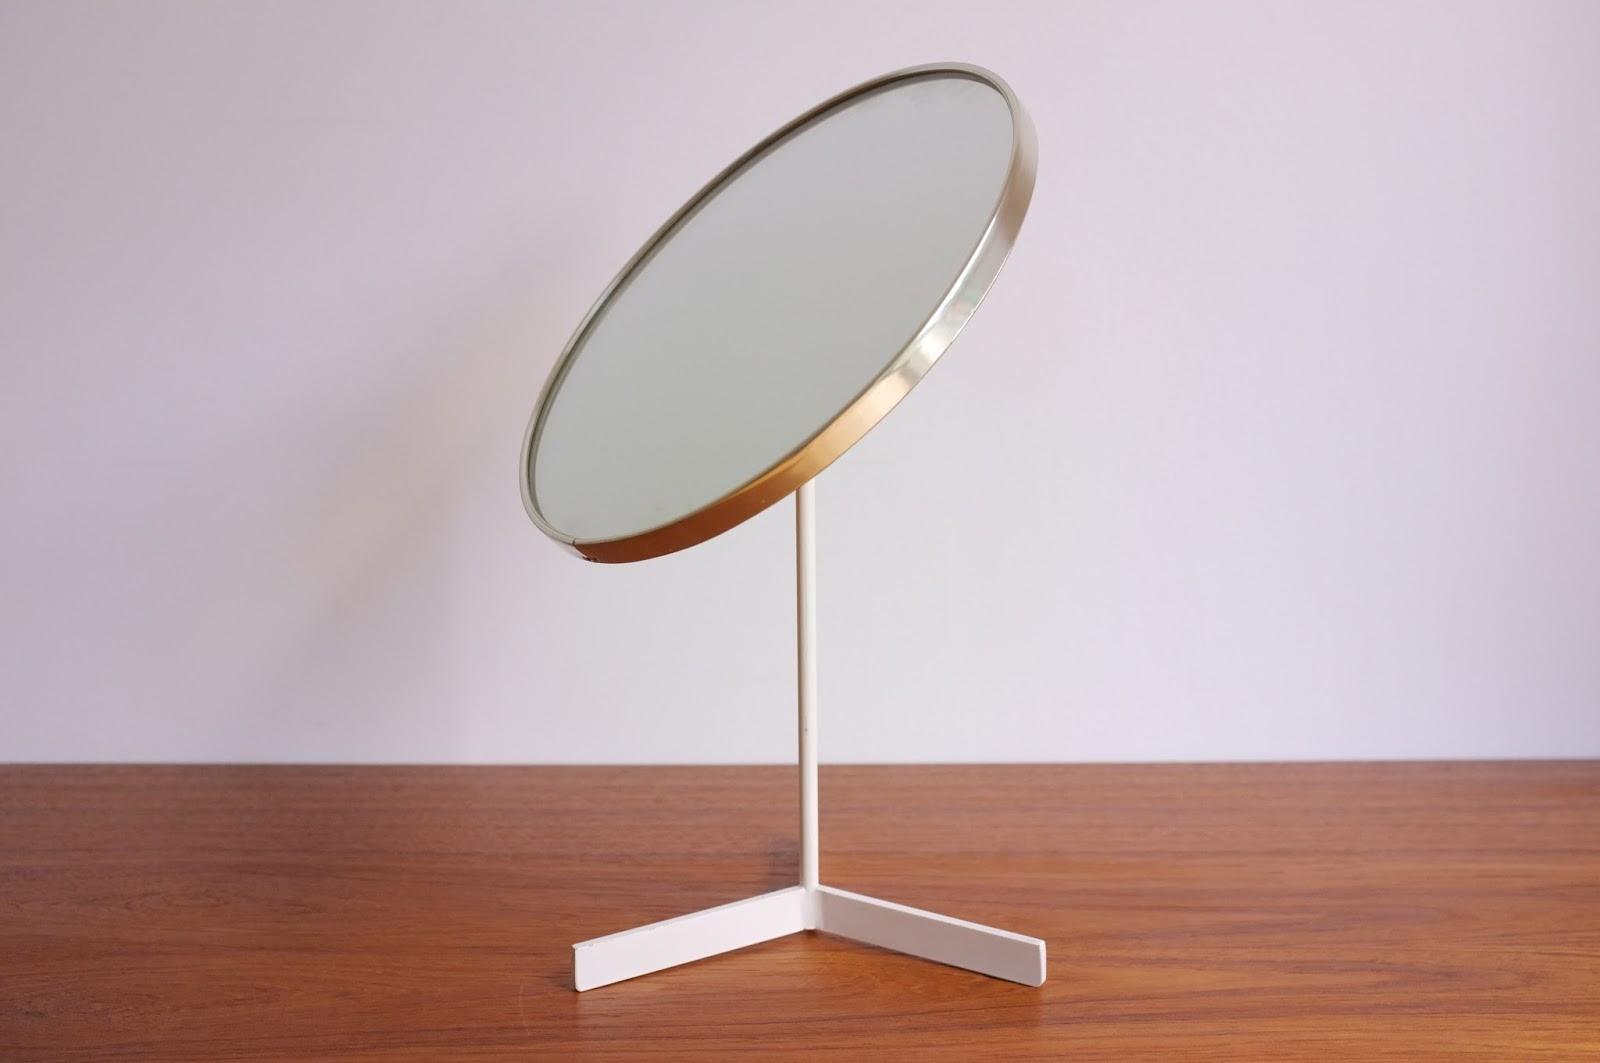 antikmodern: the shop: mid-century modern table mirror